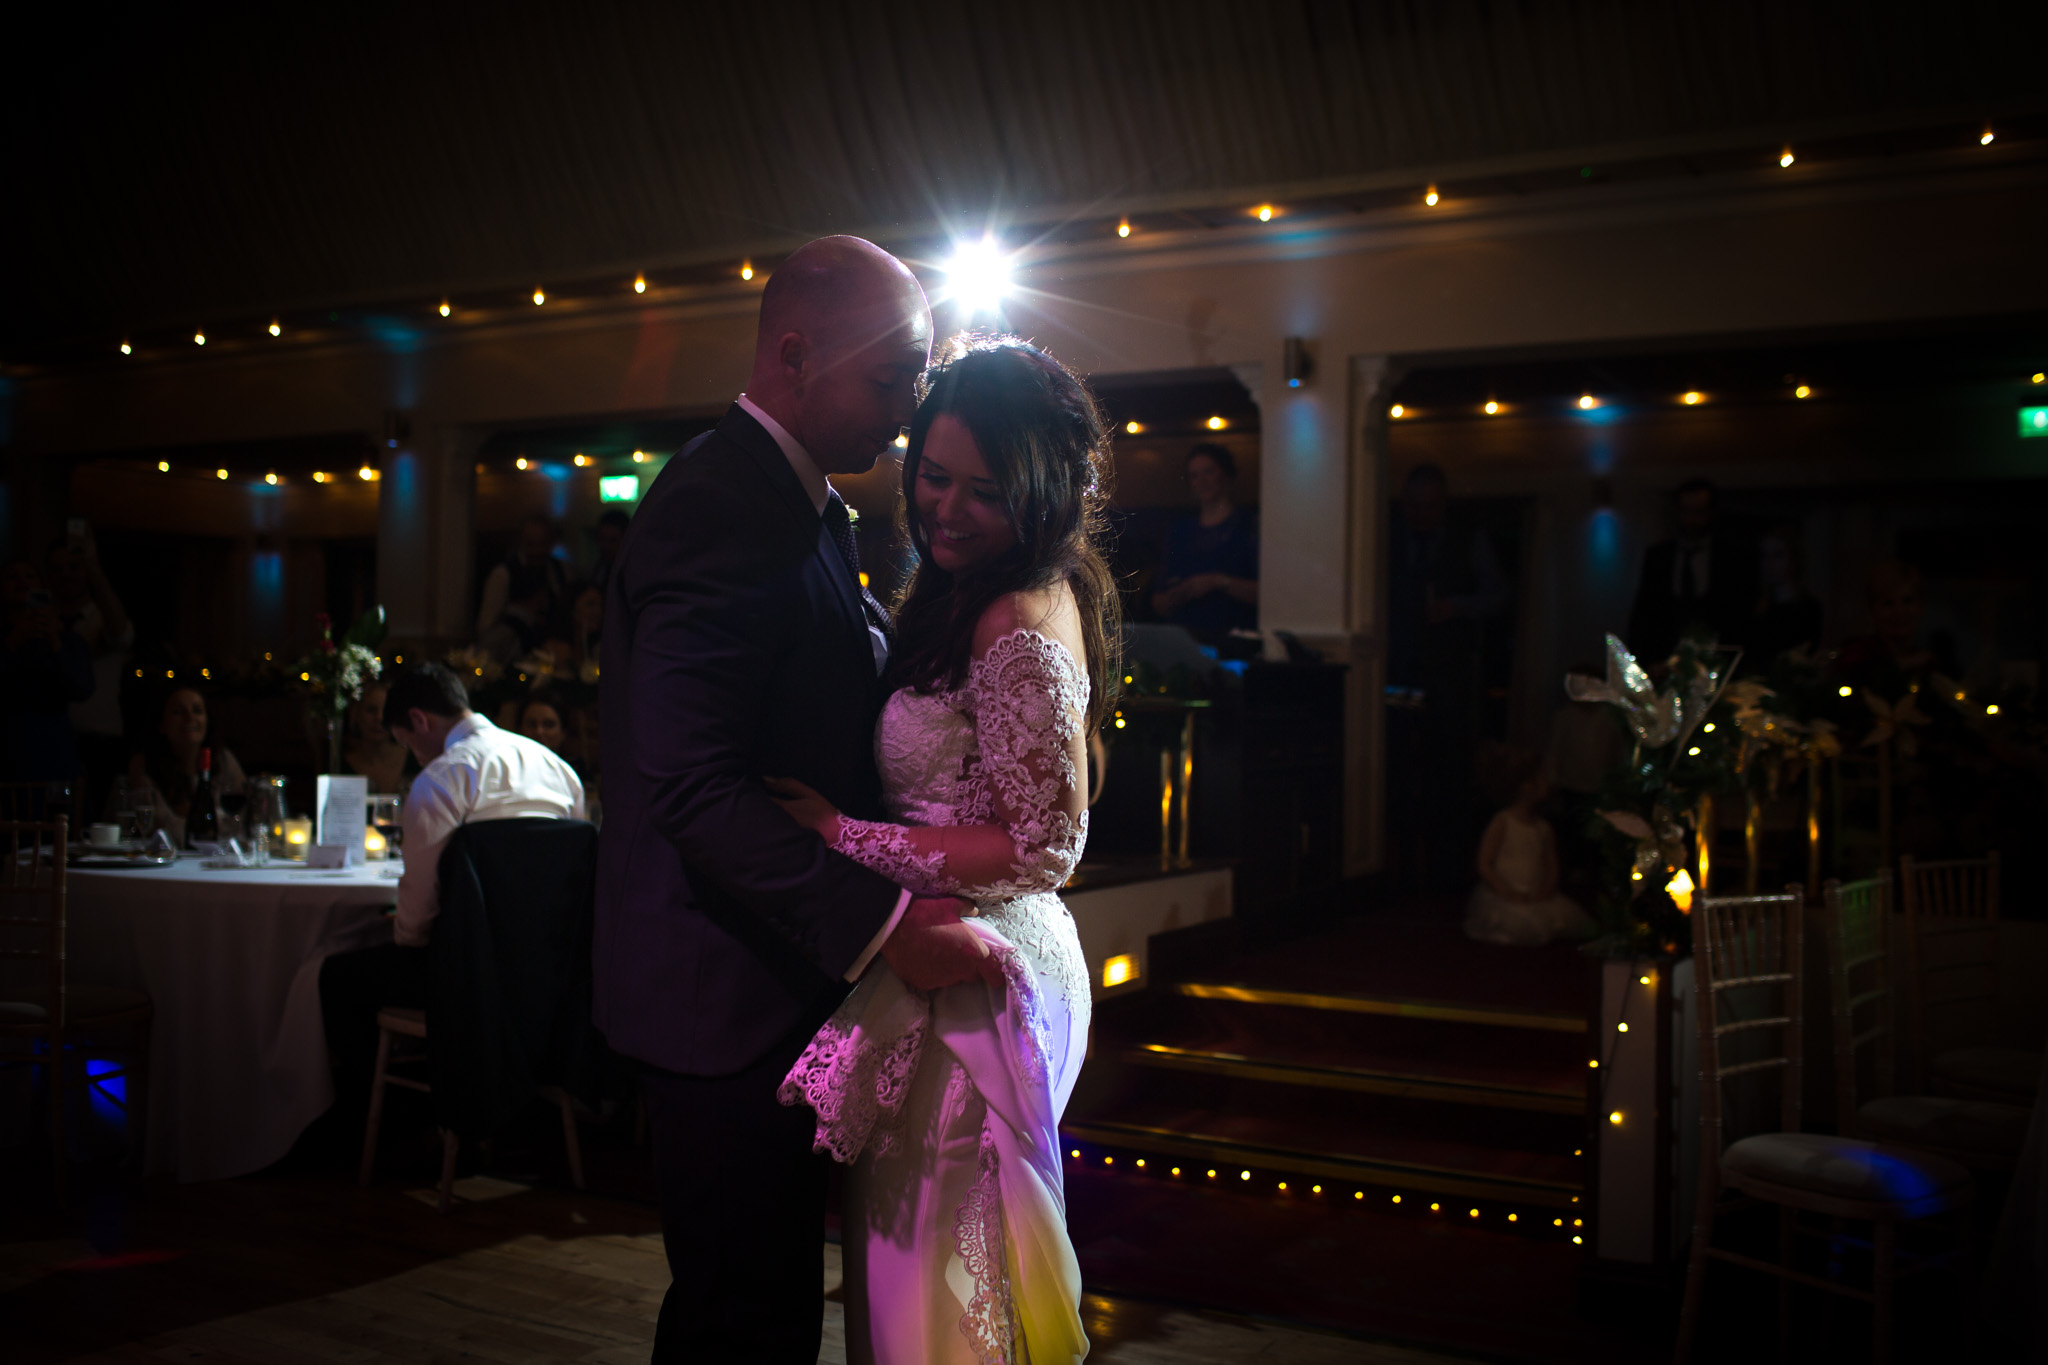 Mark_Barnes_Northern_Ireland_wedding_photographer_Harveys_Point_Donegall_Wedding_photography-Adam&Gemma-62.jpg